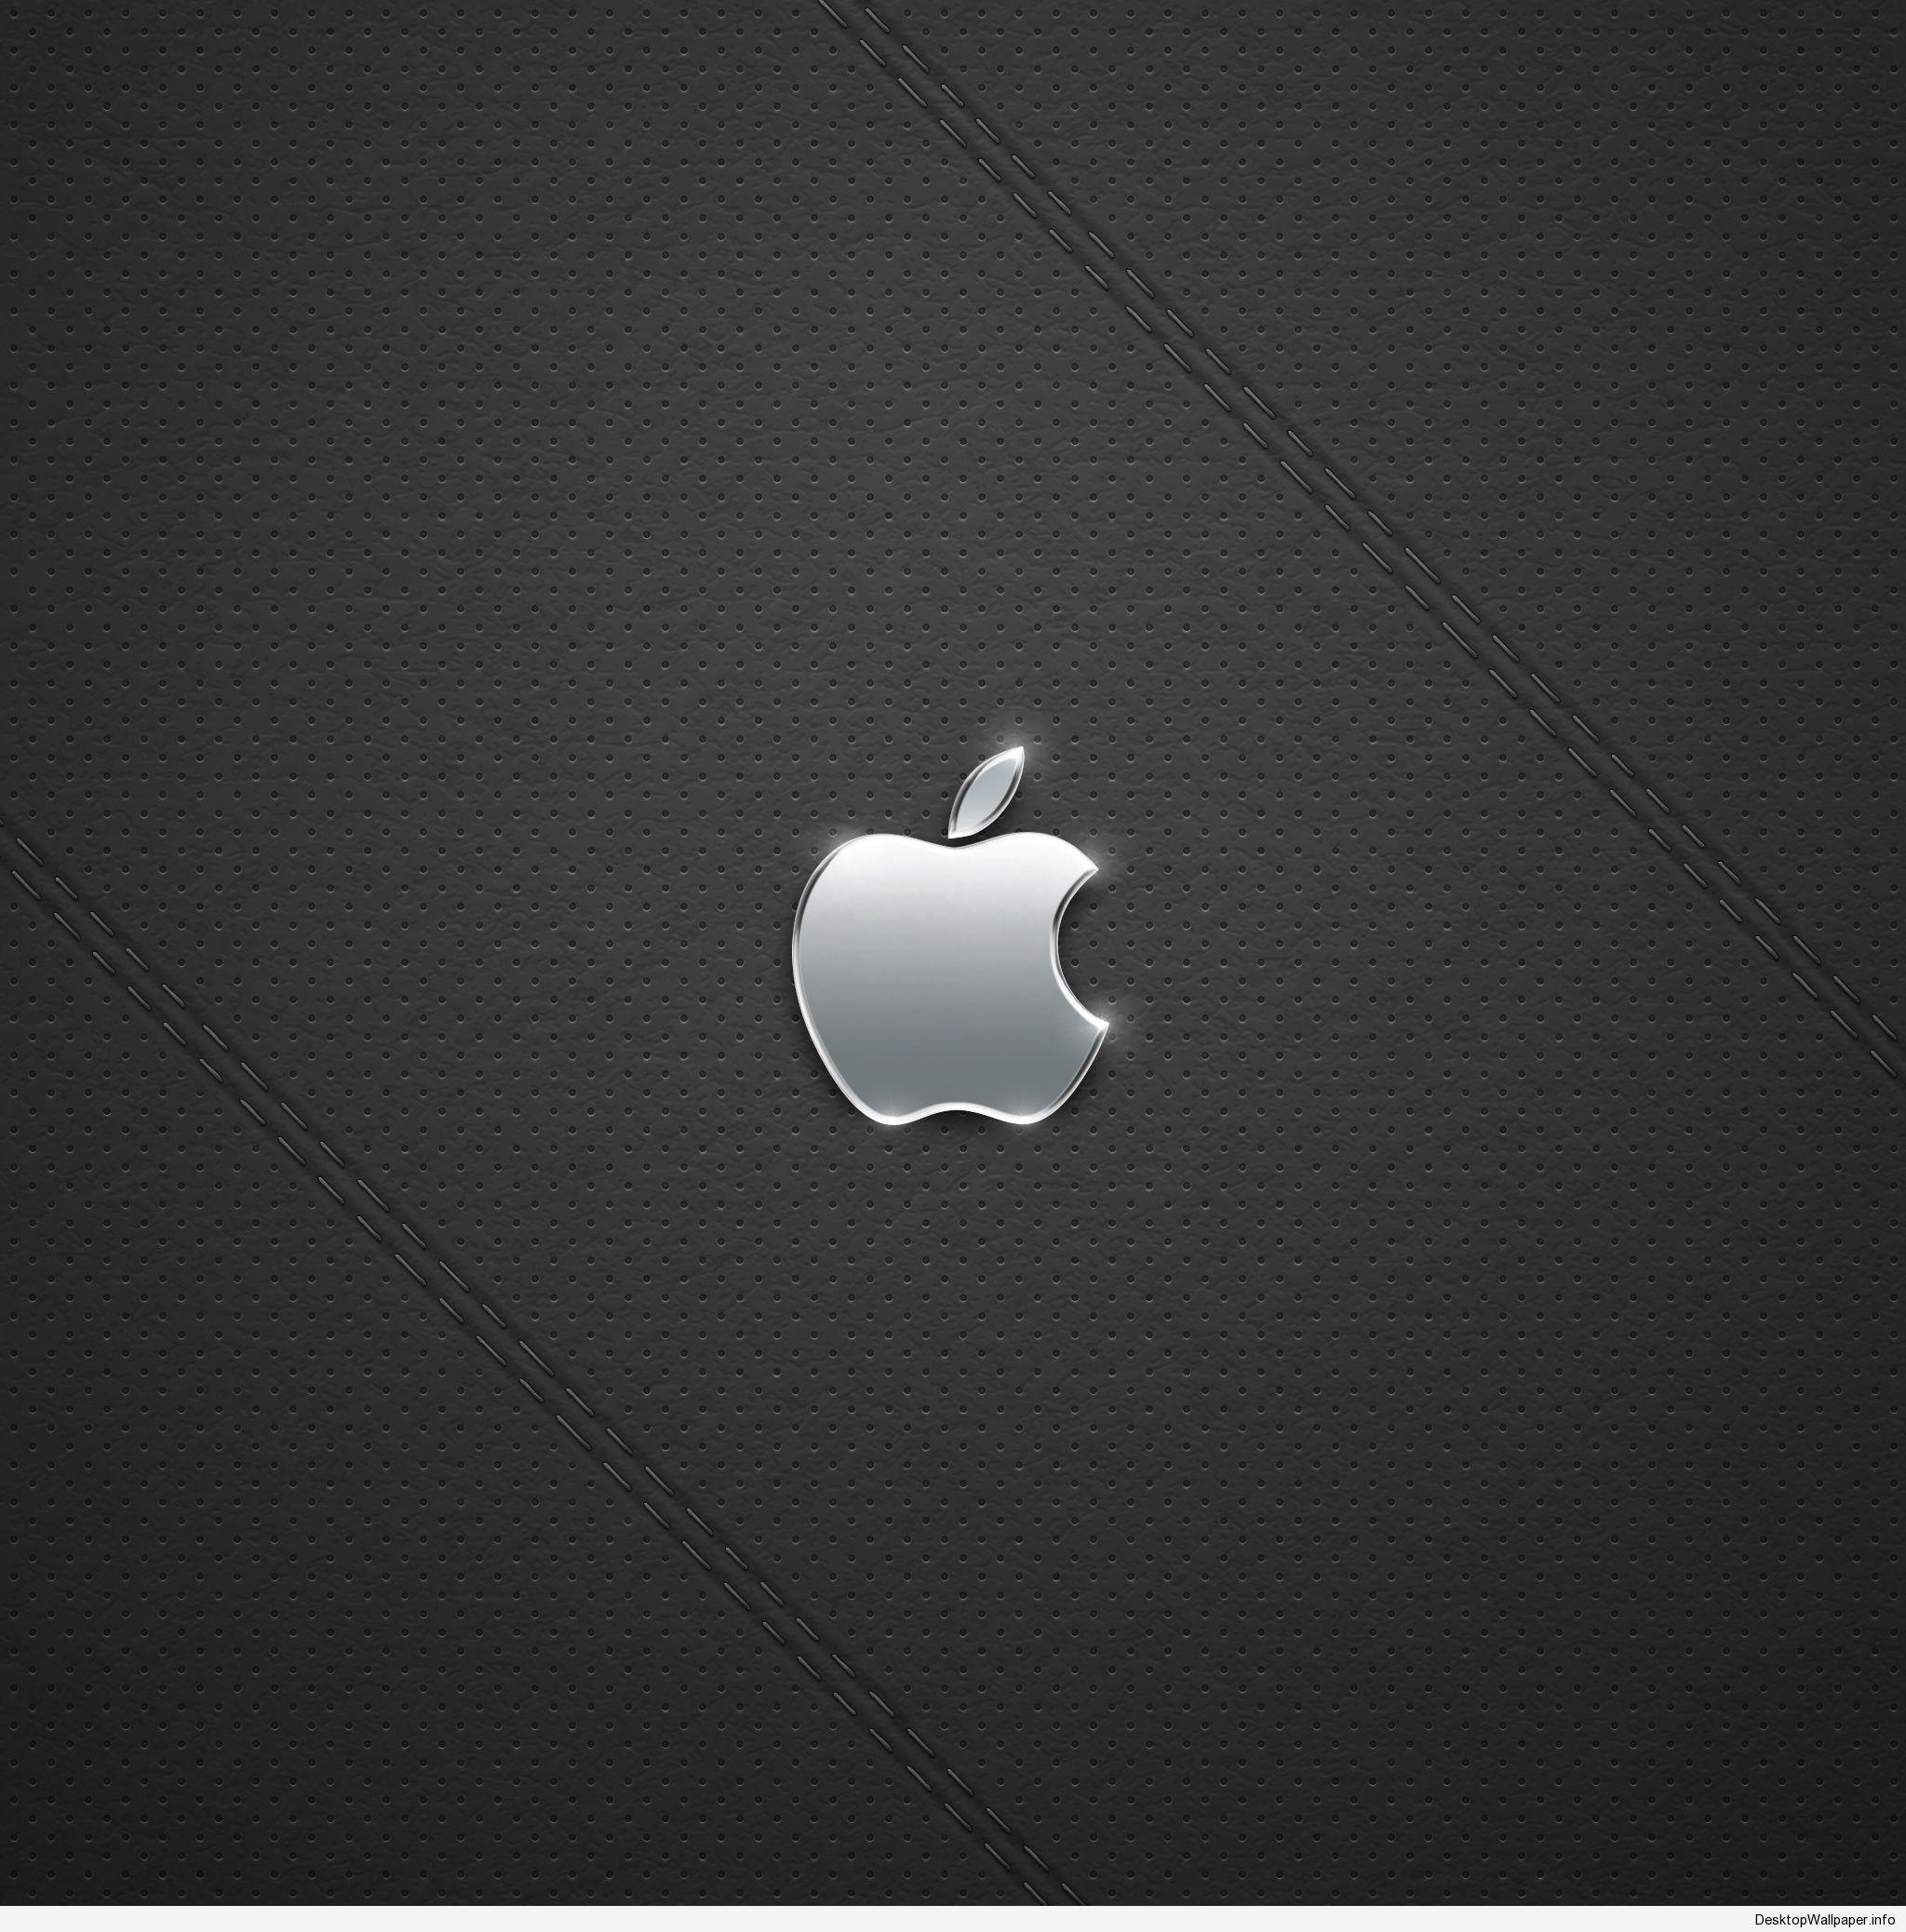 Ipad Wallpaper Download Http Desktopwallpaper Info Ipad Wallpaper Download 10228 Download Wallpa Apple Ipad Wallpaper Ipad Wallpaper Ipad Air Wallpaper